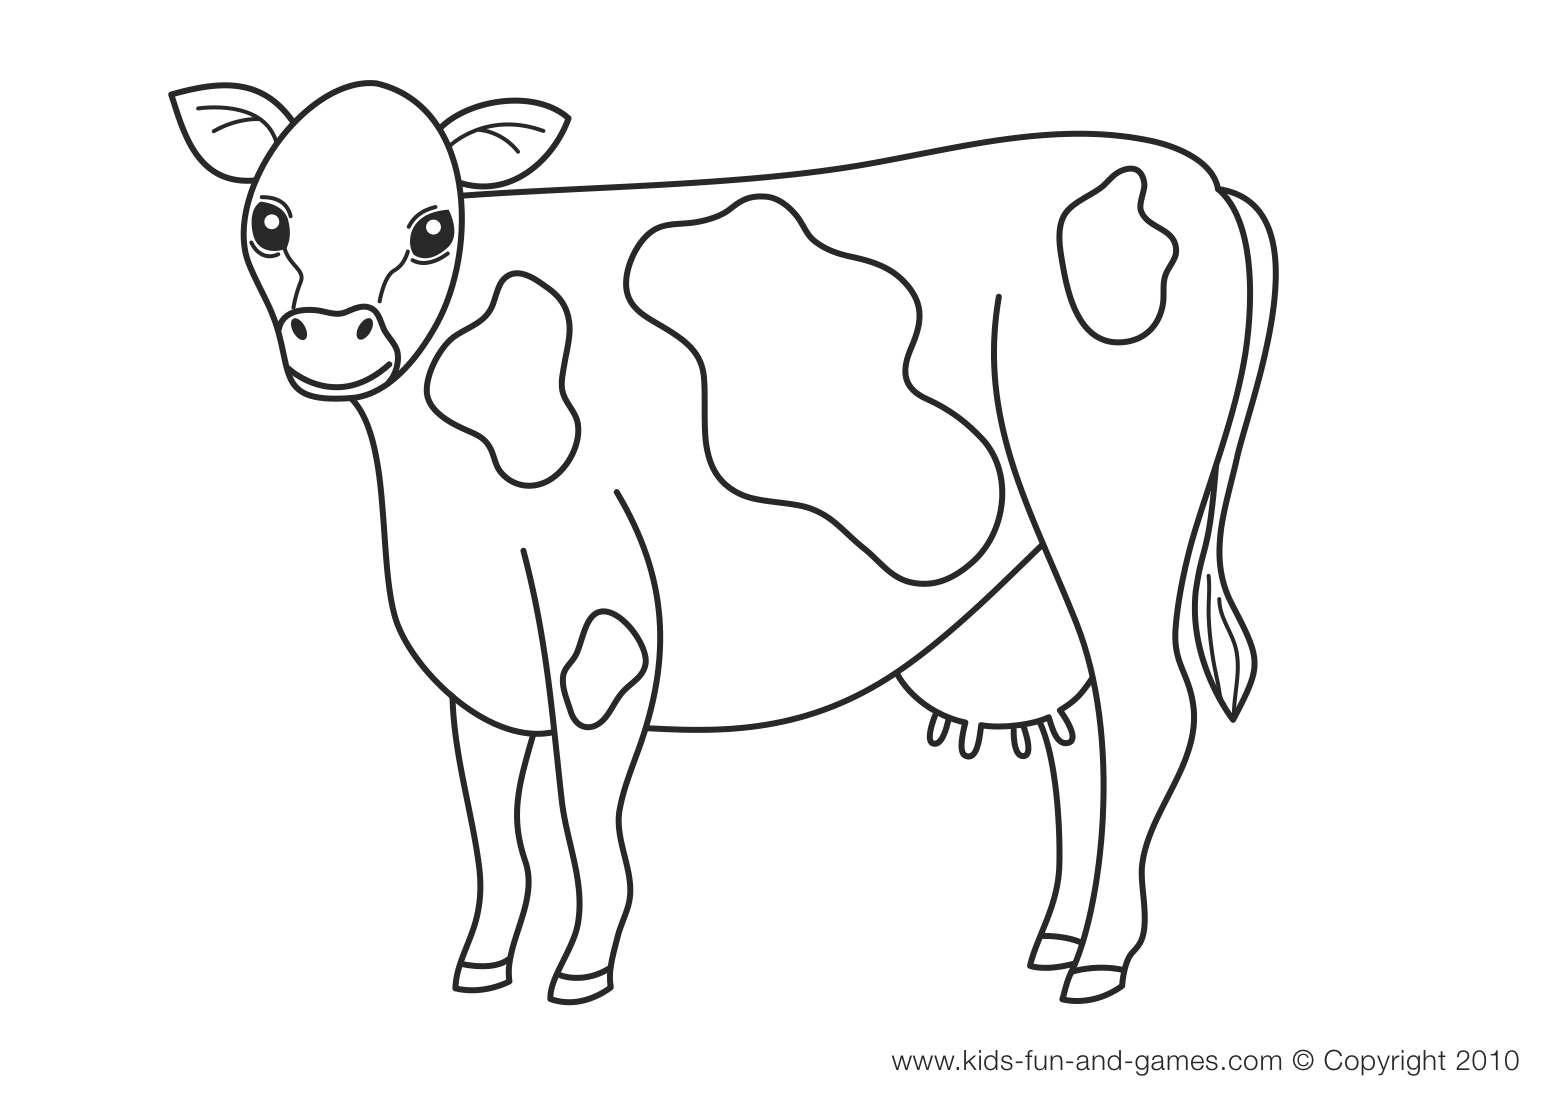 gambar hewan kurban lucu gambar penyembelihan hewan kurban gambar hewan qurban Mewarnai Gambar